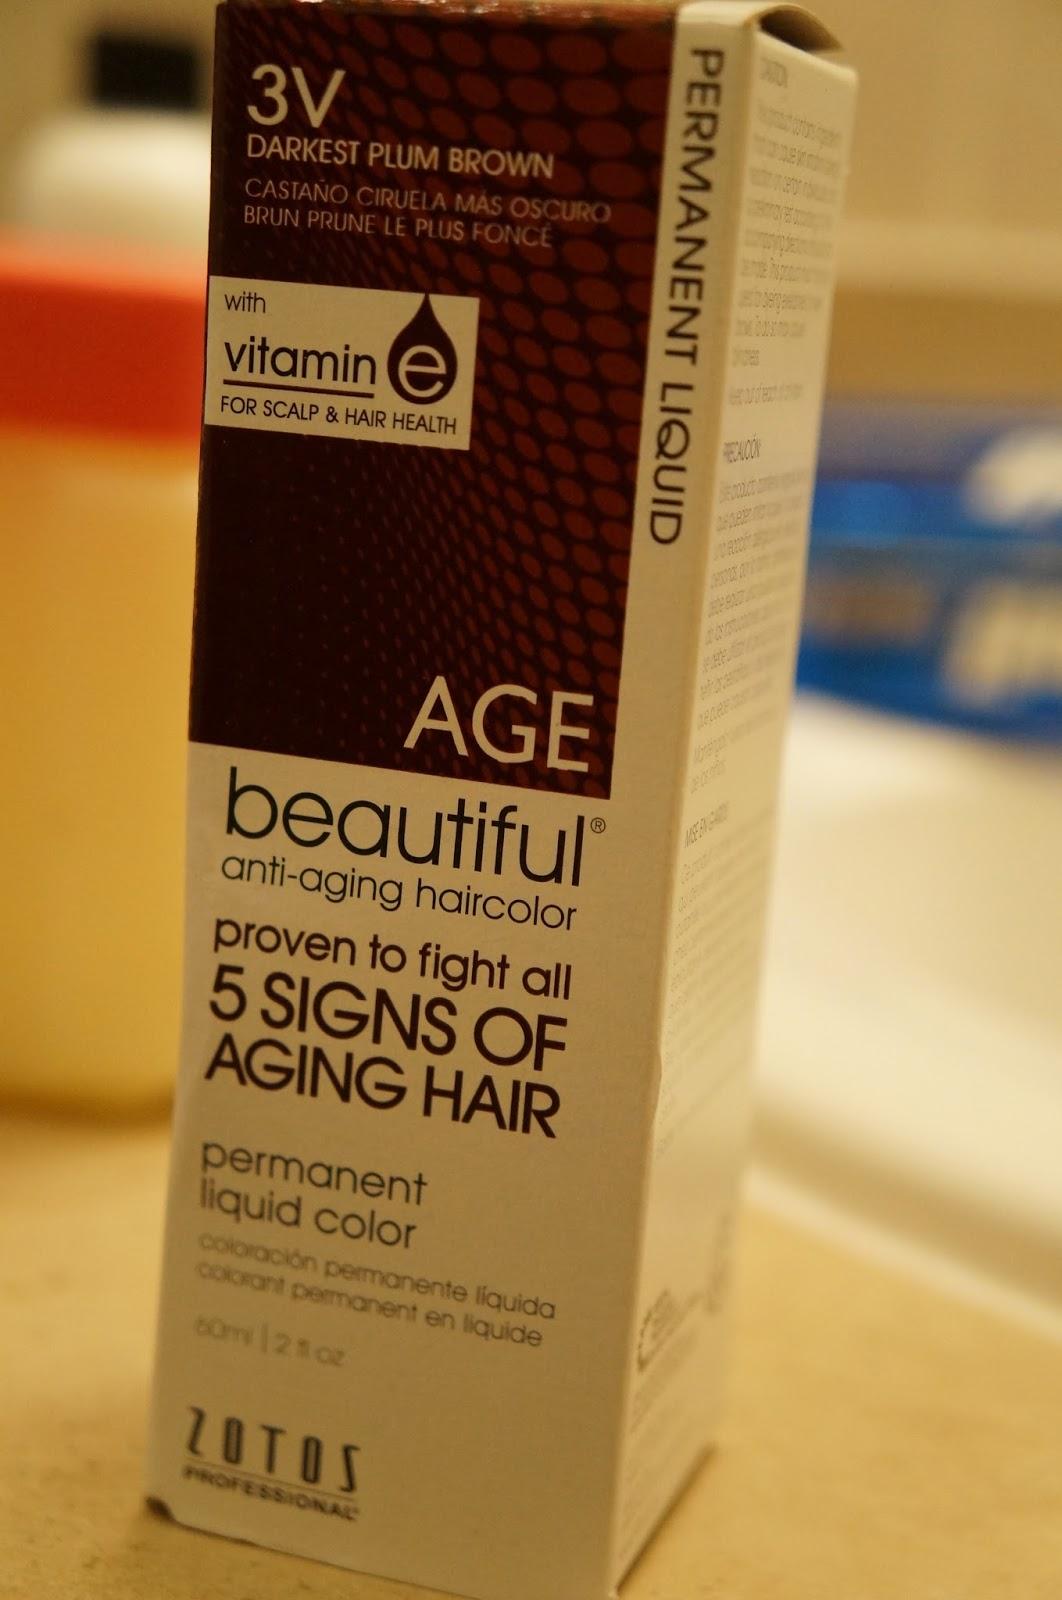 Teaseblendglam Beautyfashiondiy More My Burgundy Plum Hair